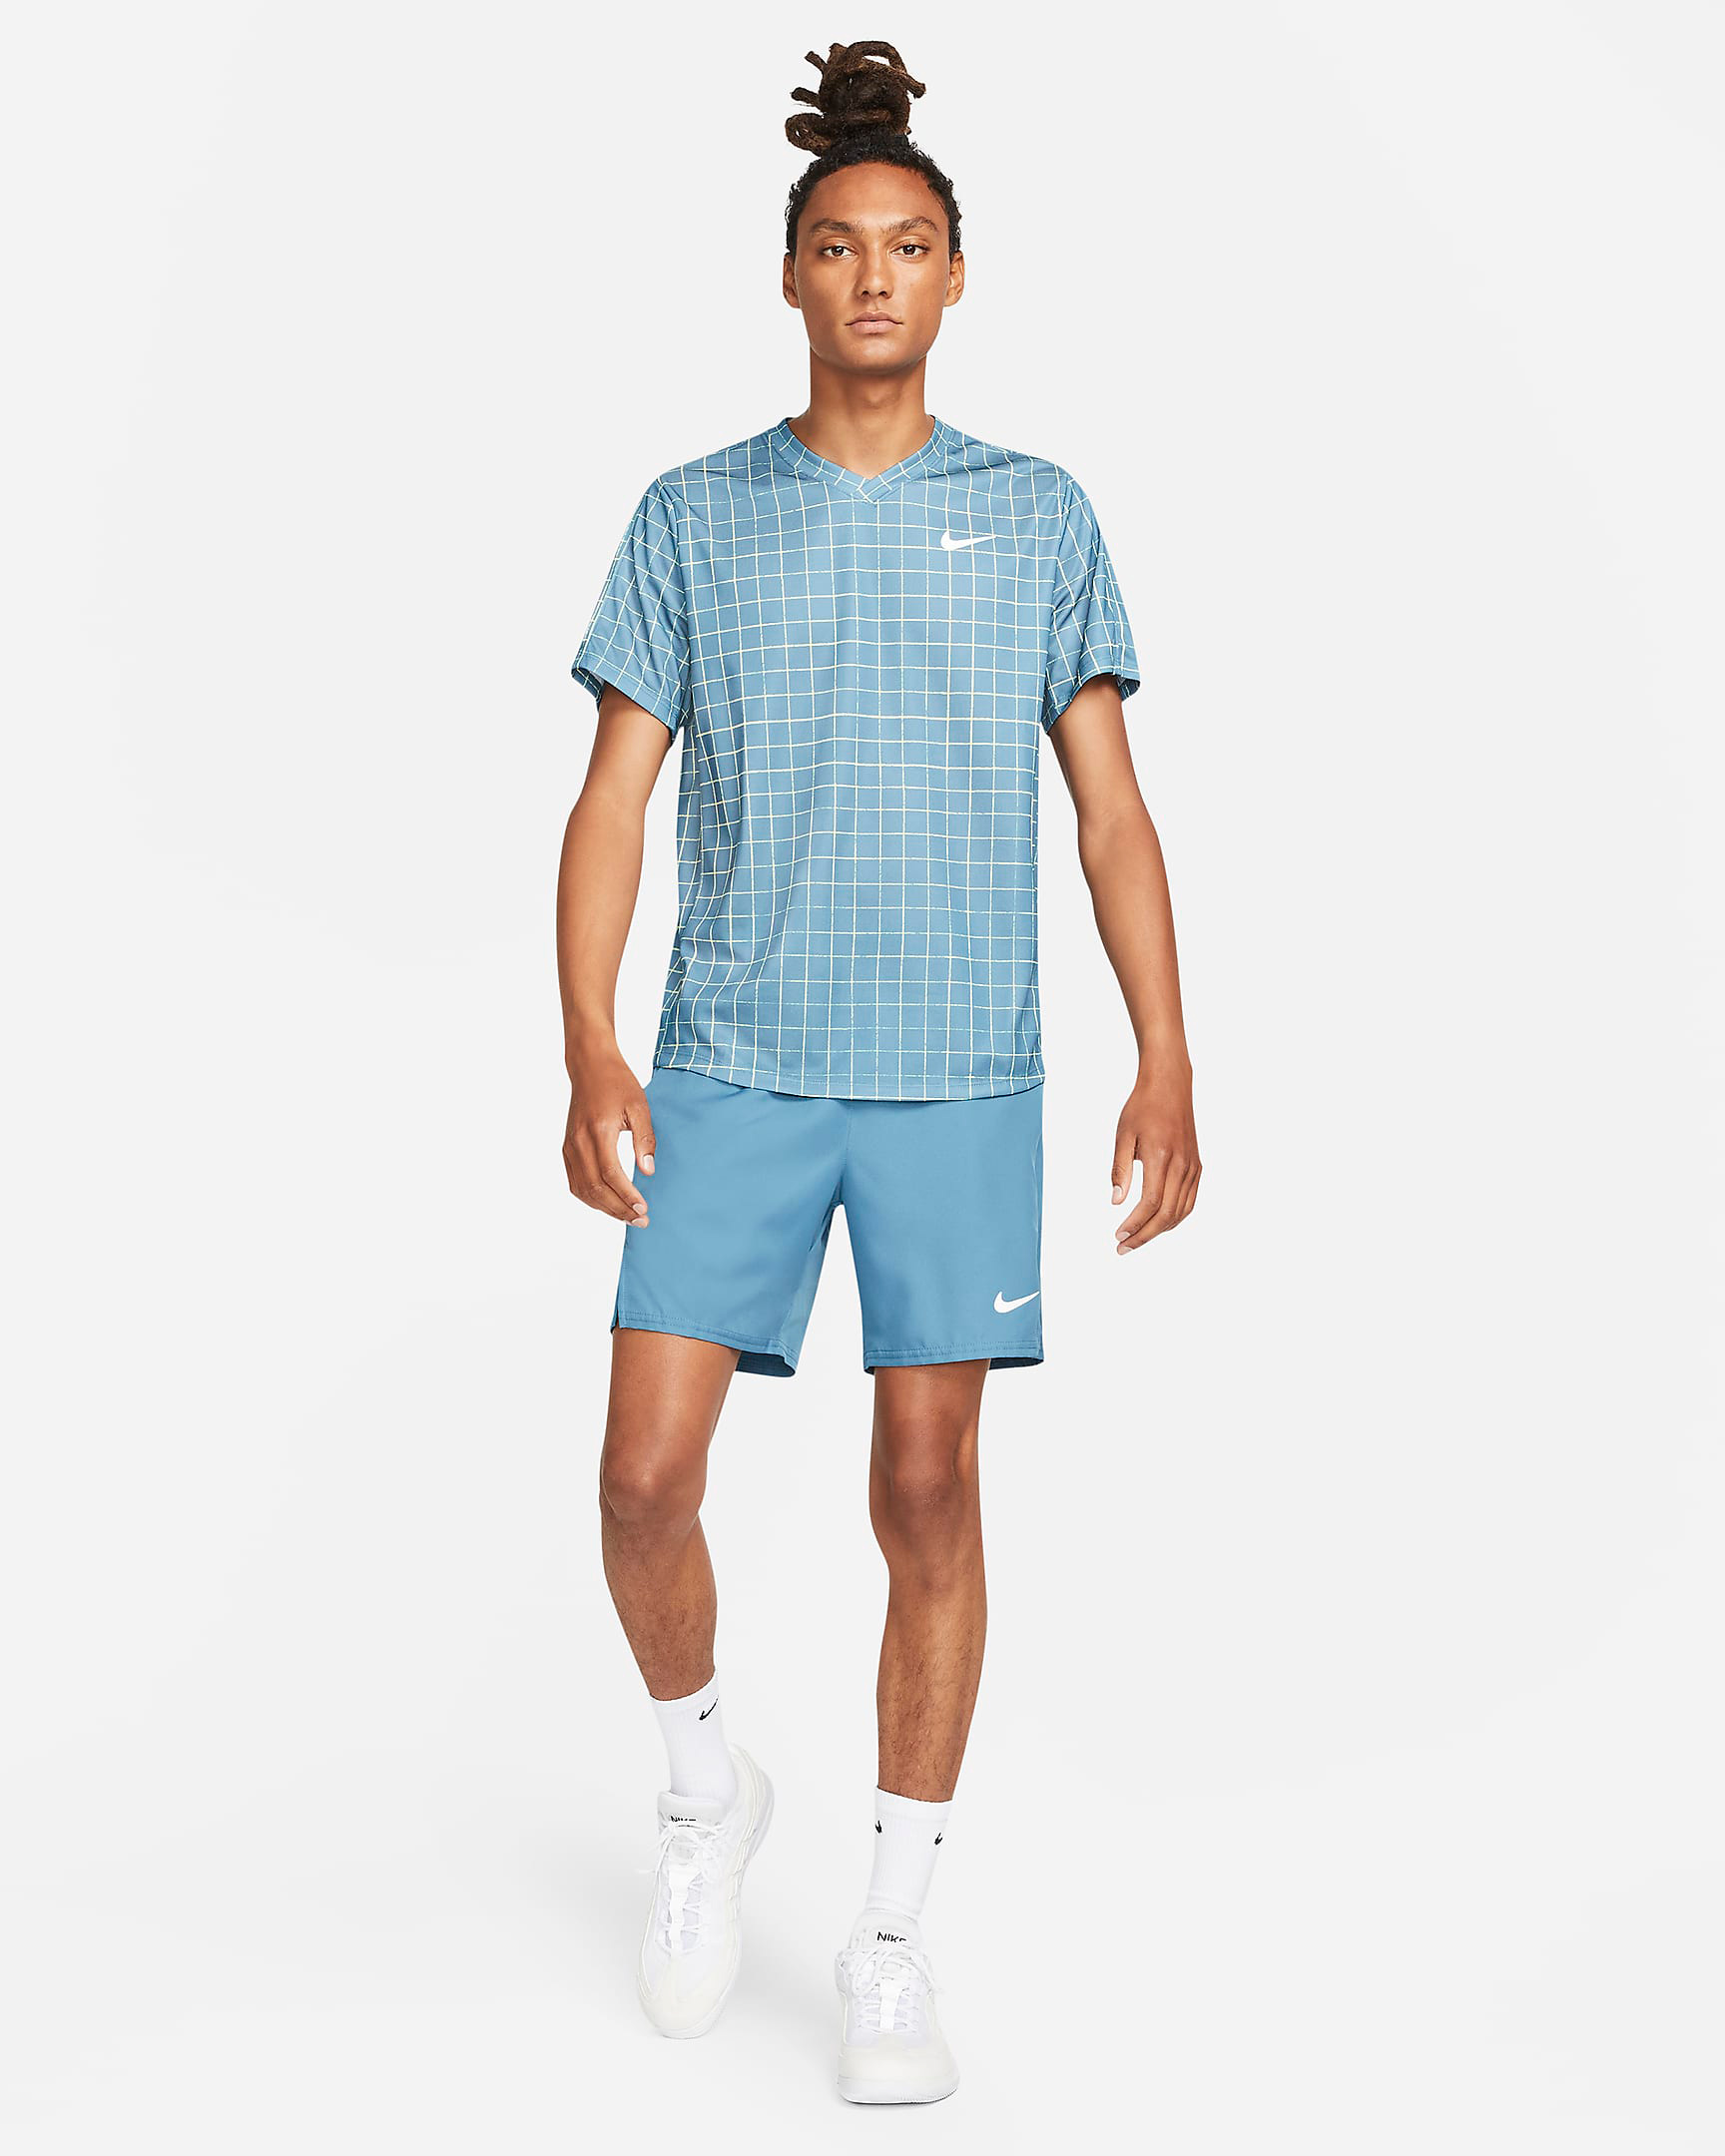 nike-rift-blue-shirt-shorts-outfit